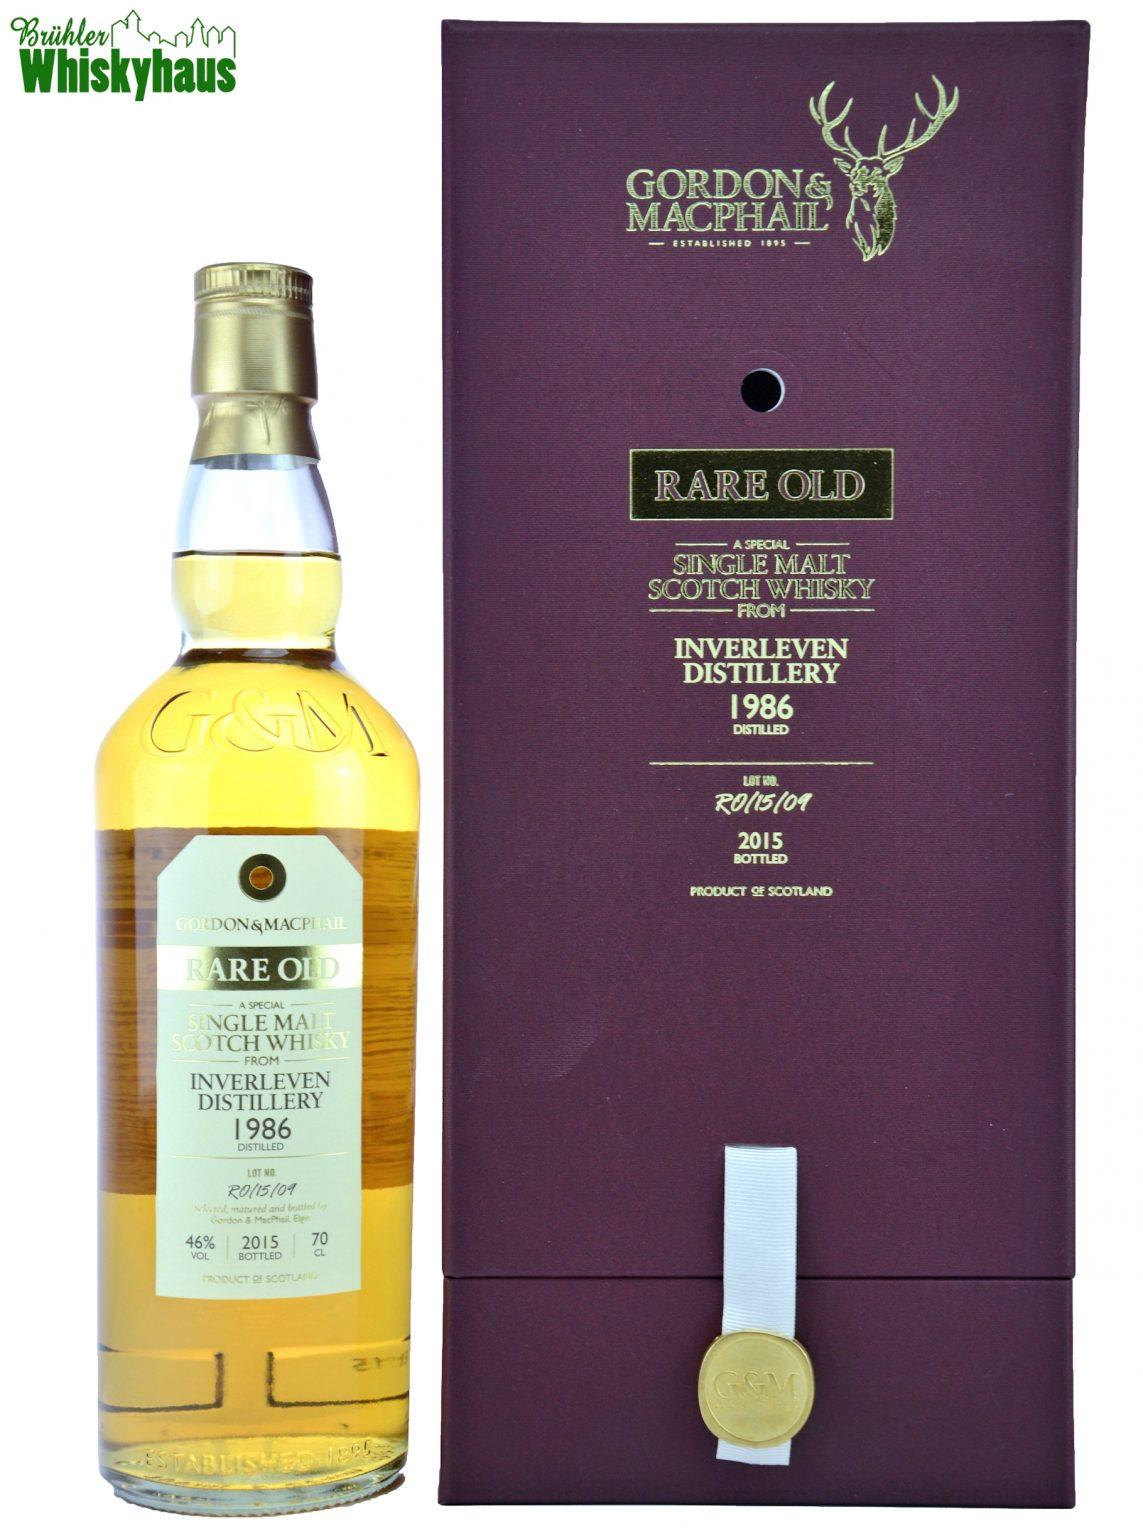 Inverleven Vintage 1986 - 29 Jahre - Refill Bourbon Cask No. RO/15/09 - Gordon & MacPhail - Single Malt Scotch Whisky